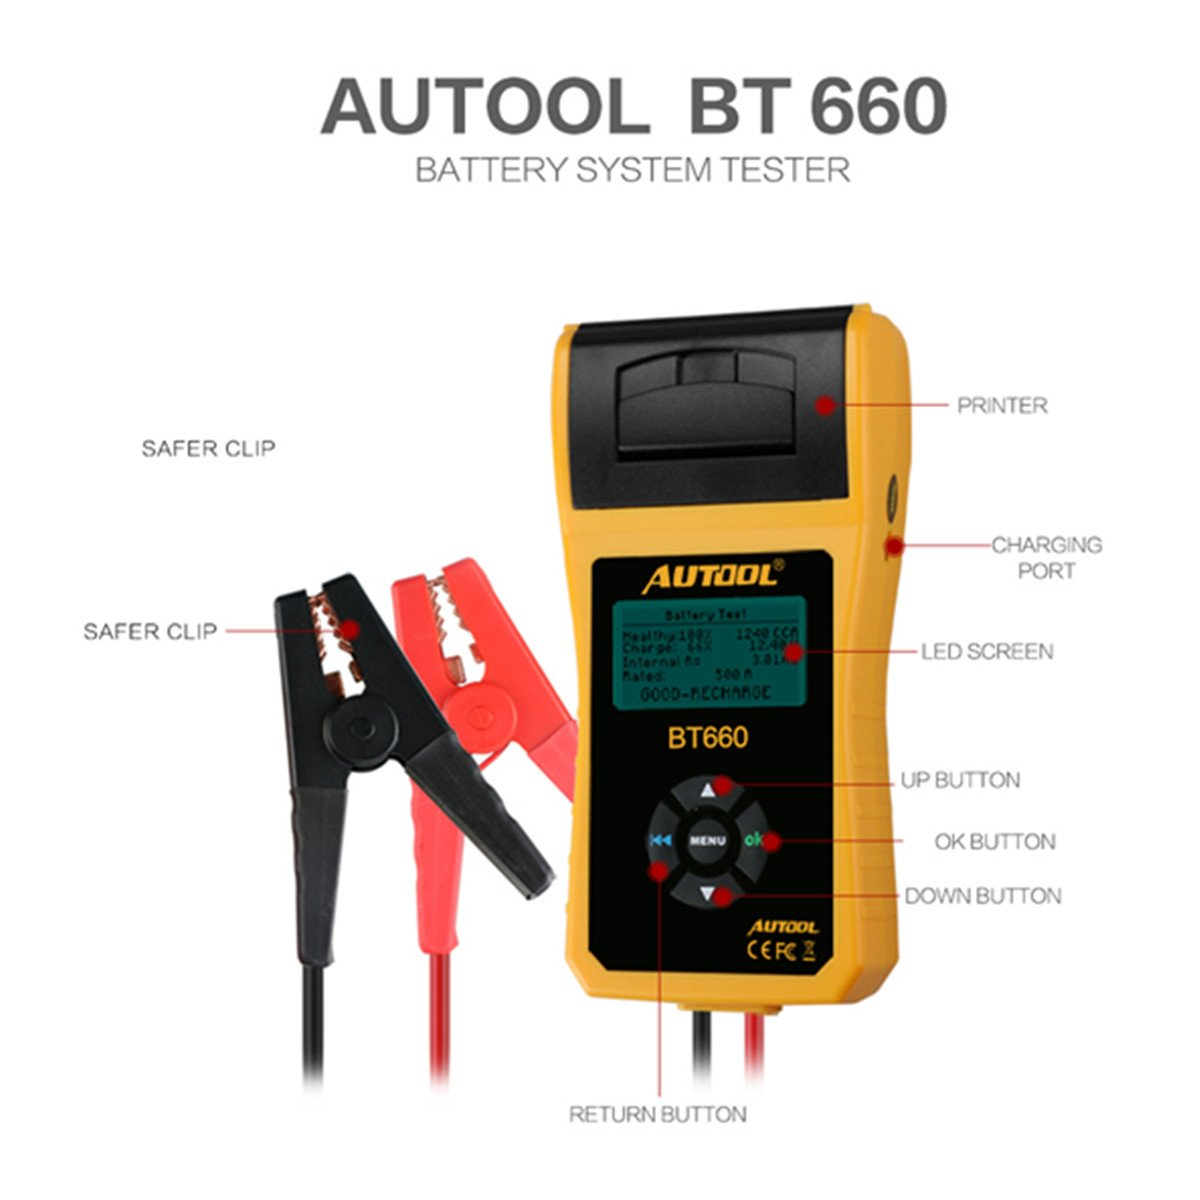 TuLanAuto 12V/24V Autool BT660 Battery Conductance Tester BT-660 Auto Battery Testers Automotive Diagnostic Tools For Heavy Duty Trucks, Light Duty Truck, Cars by TuLanAuto (Image #8)